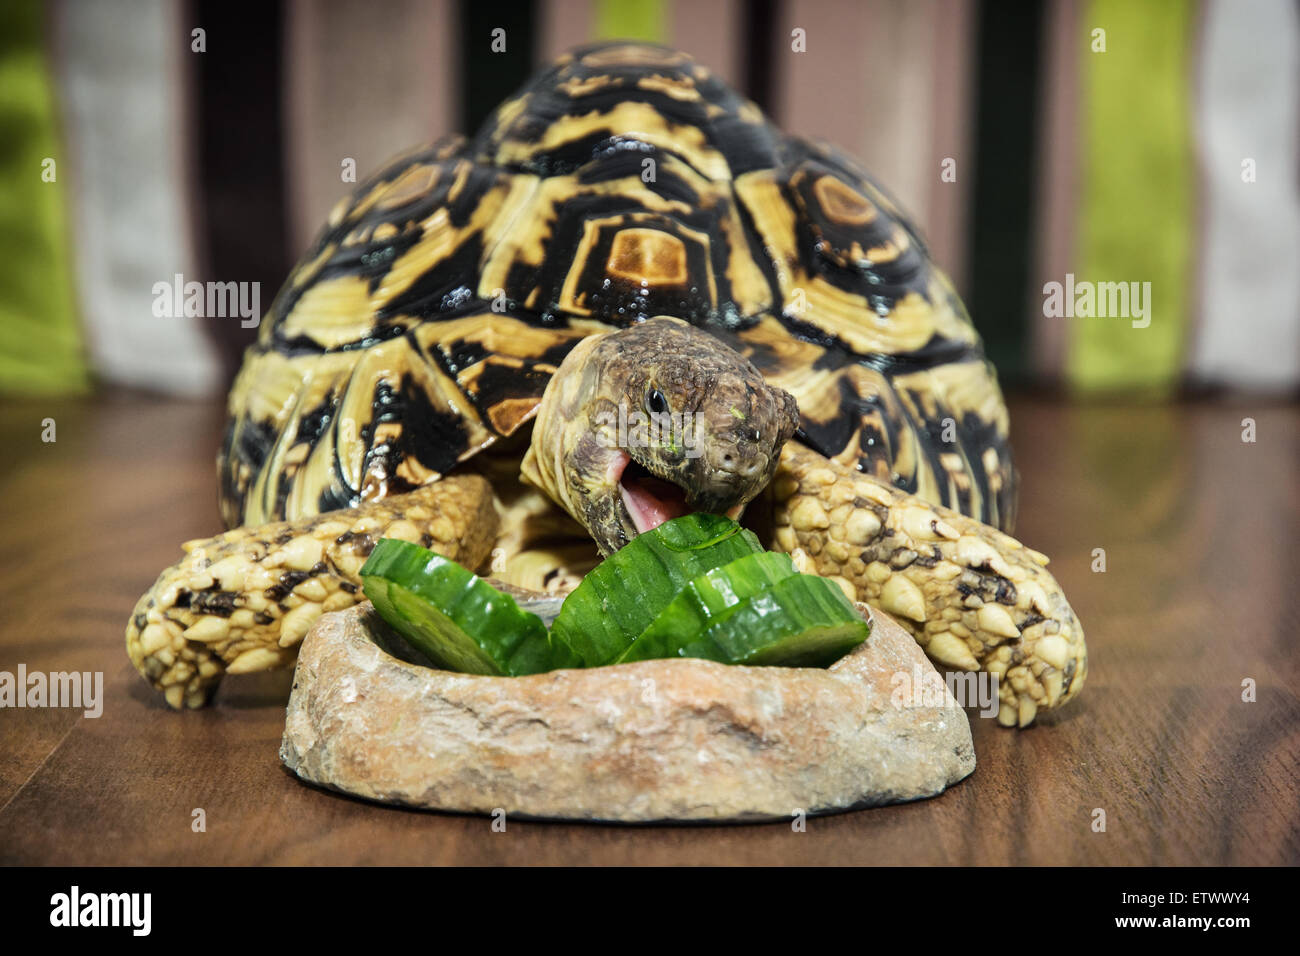 Leopard tortoise (Geochelone pardalis) eating cucumber. Animal theme. - Stock Image